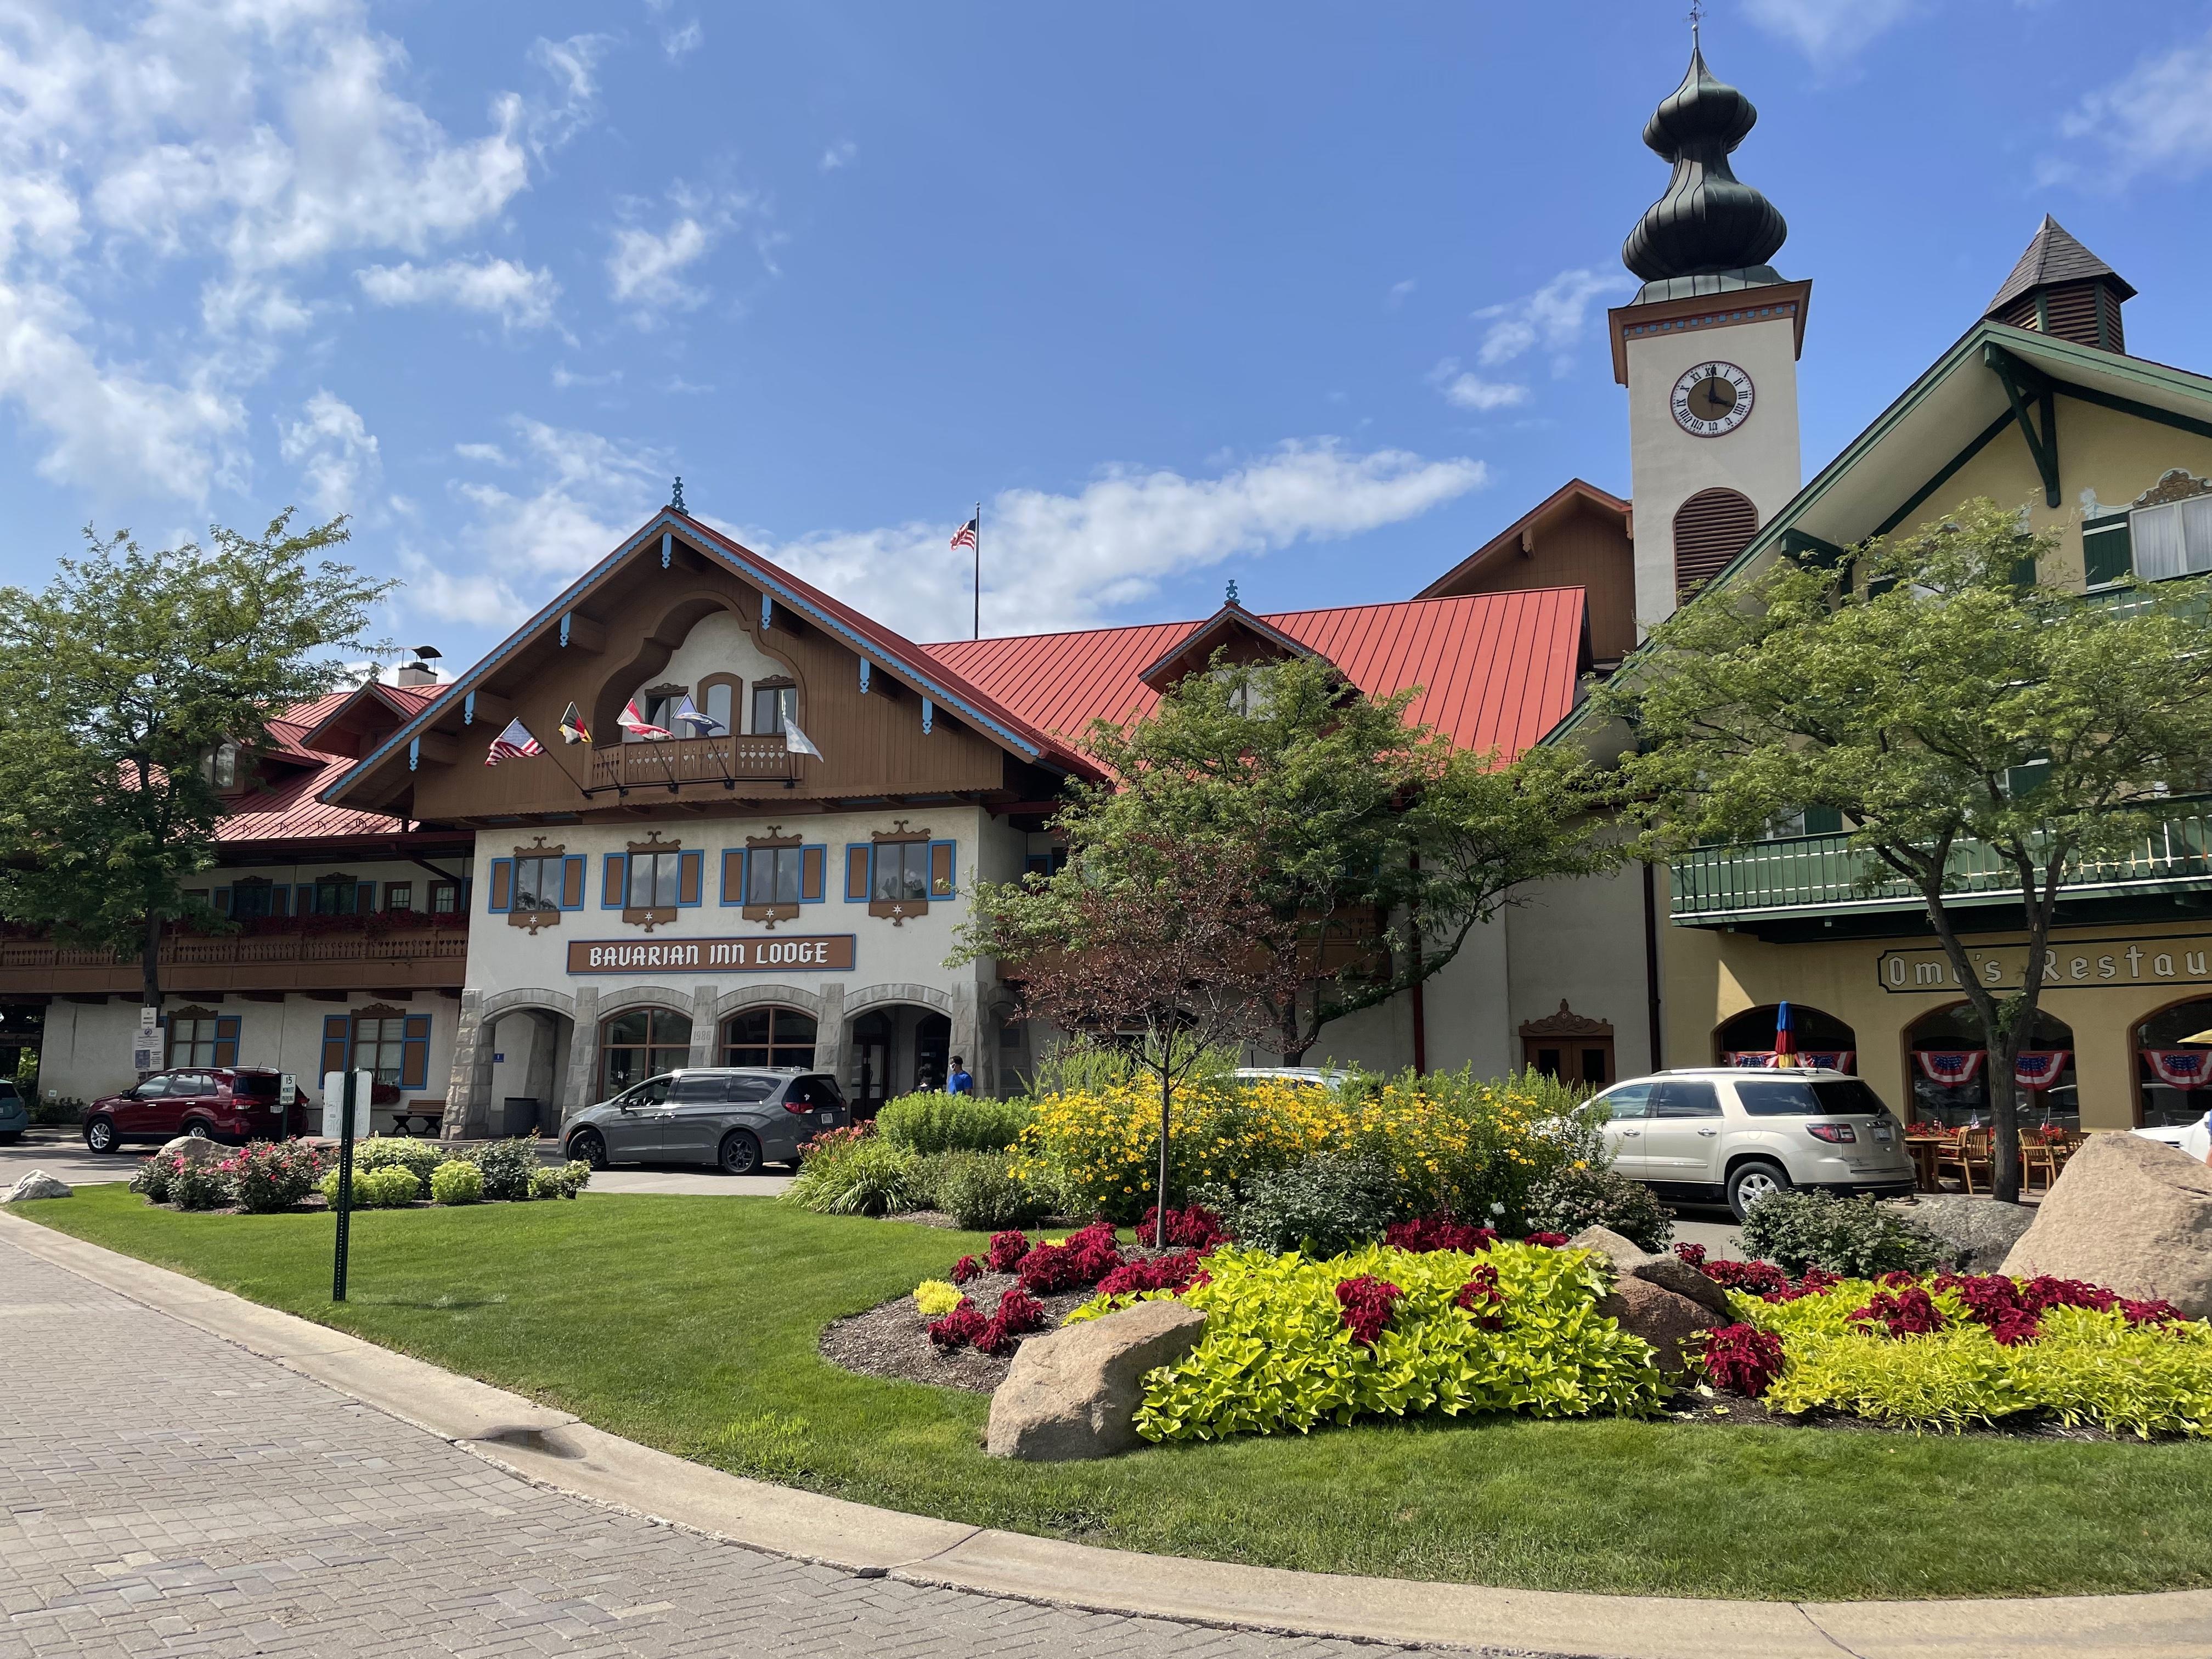 Bavarian Inn Lodge in Frankenmuth